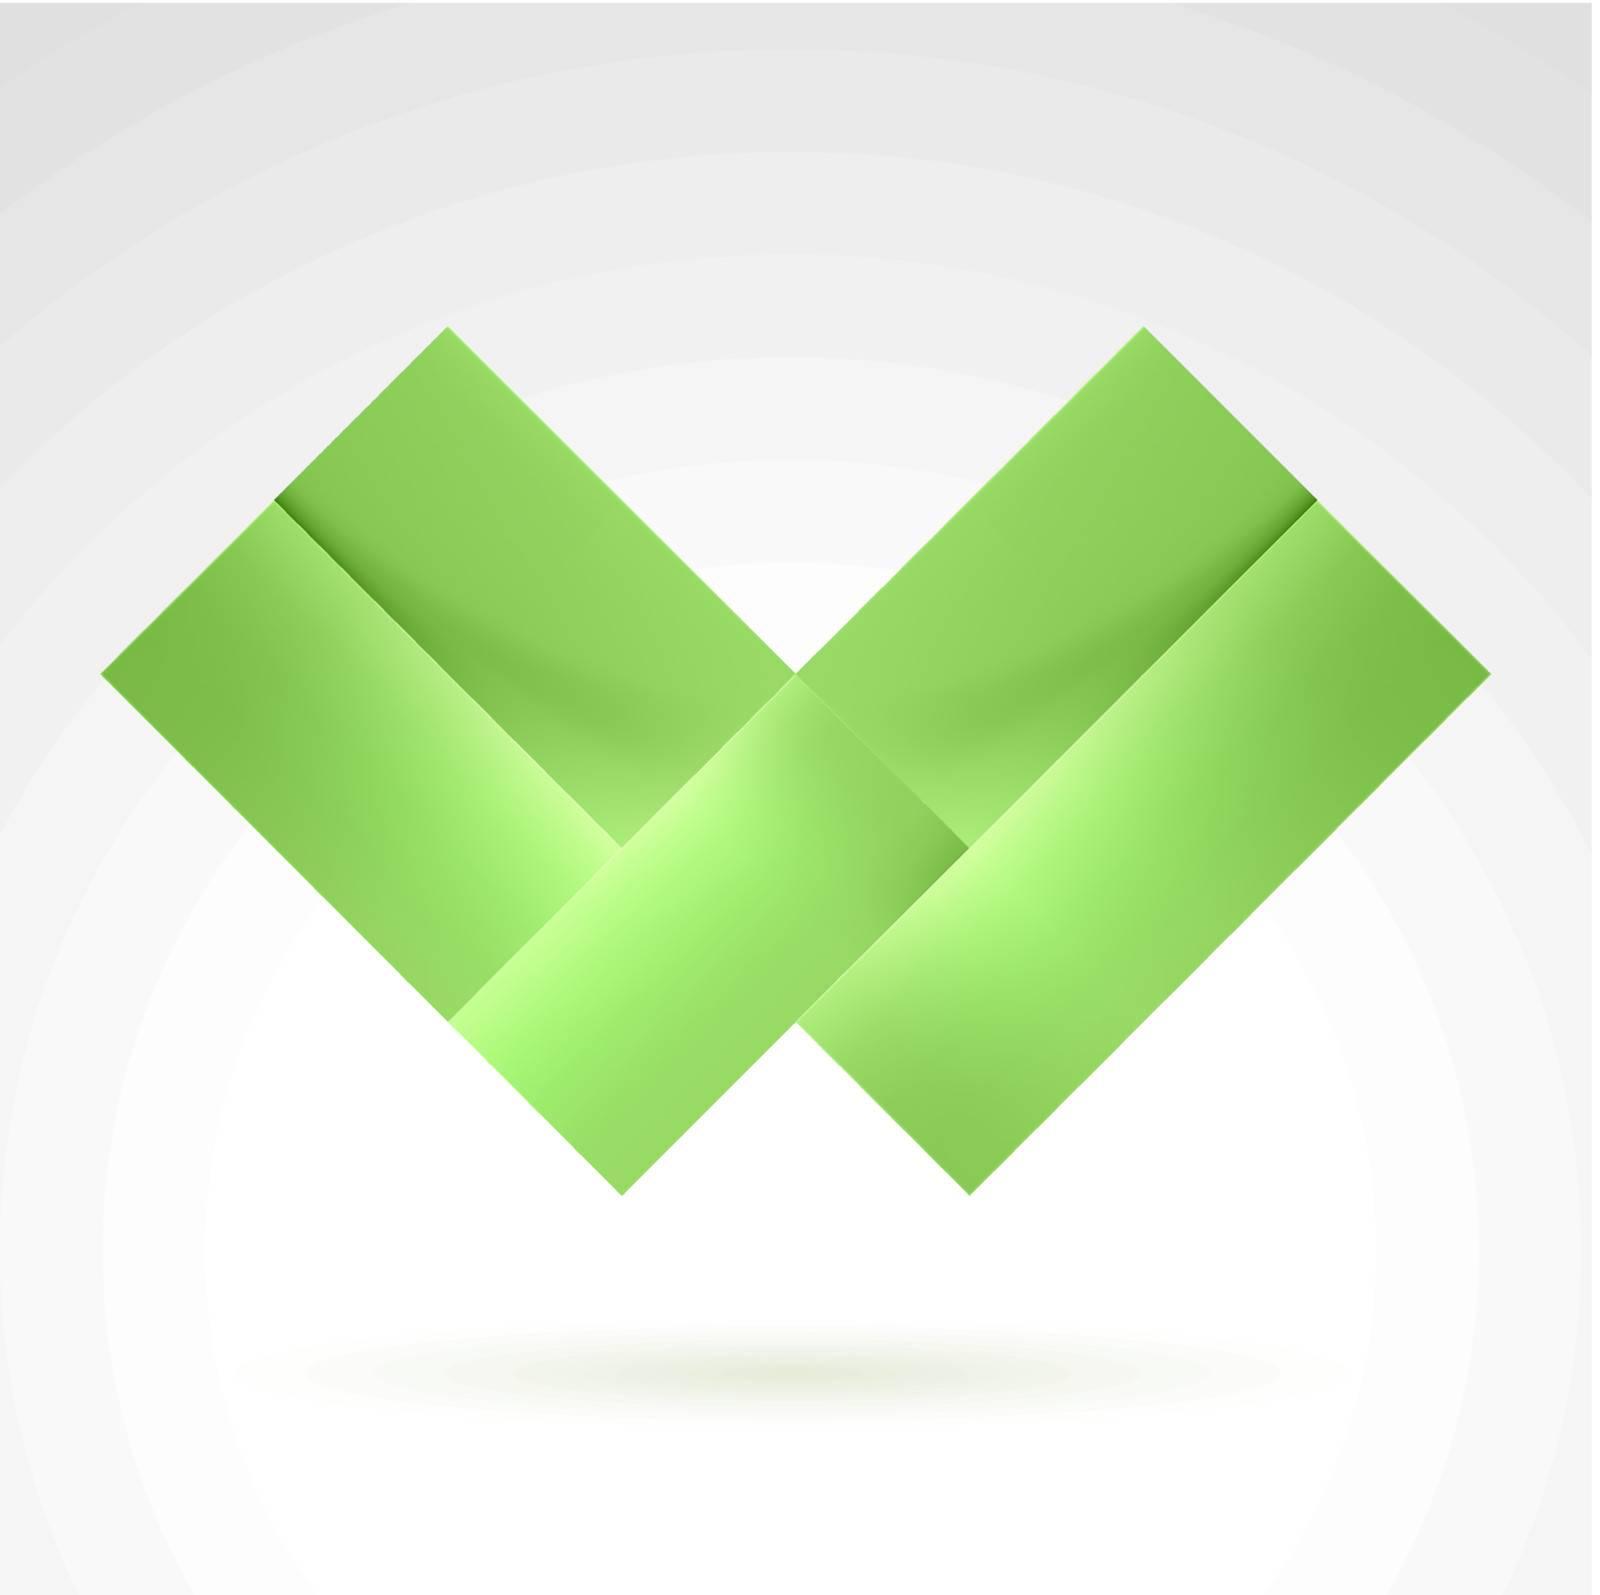 Abstract Green Tile. Illustration on white for design